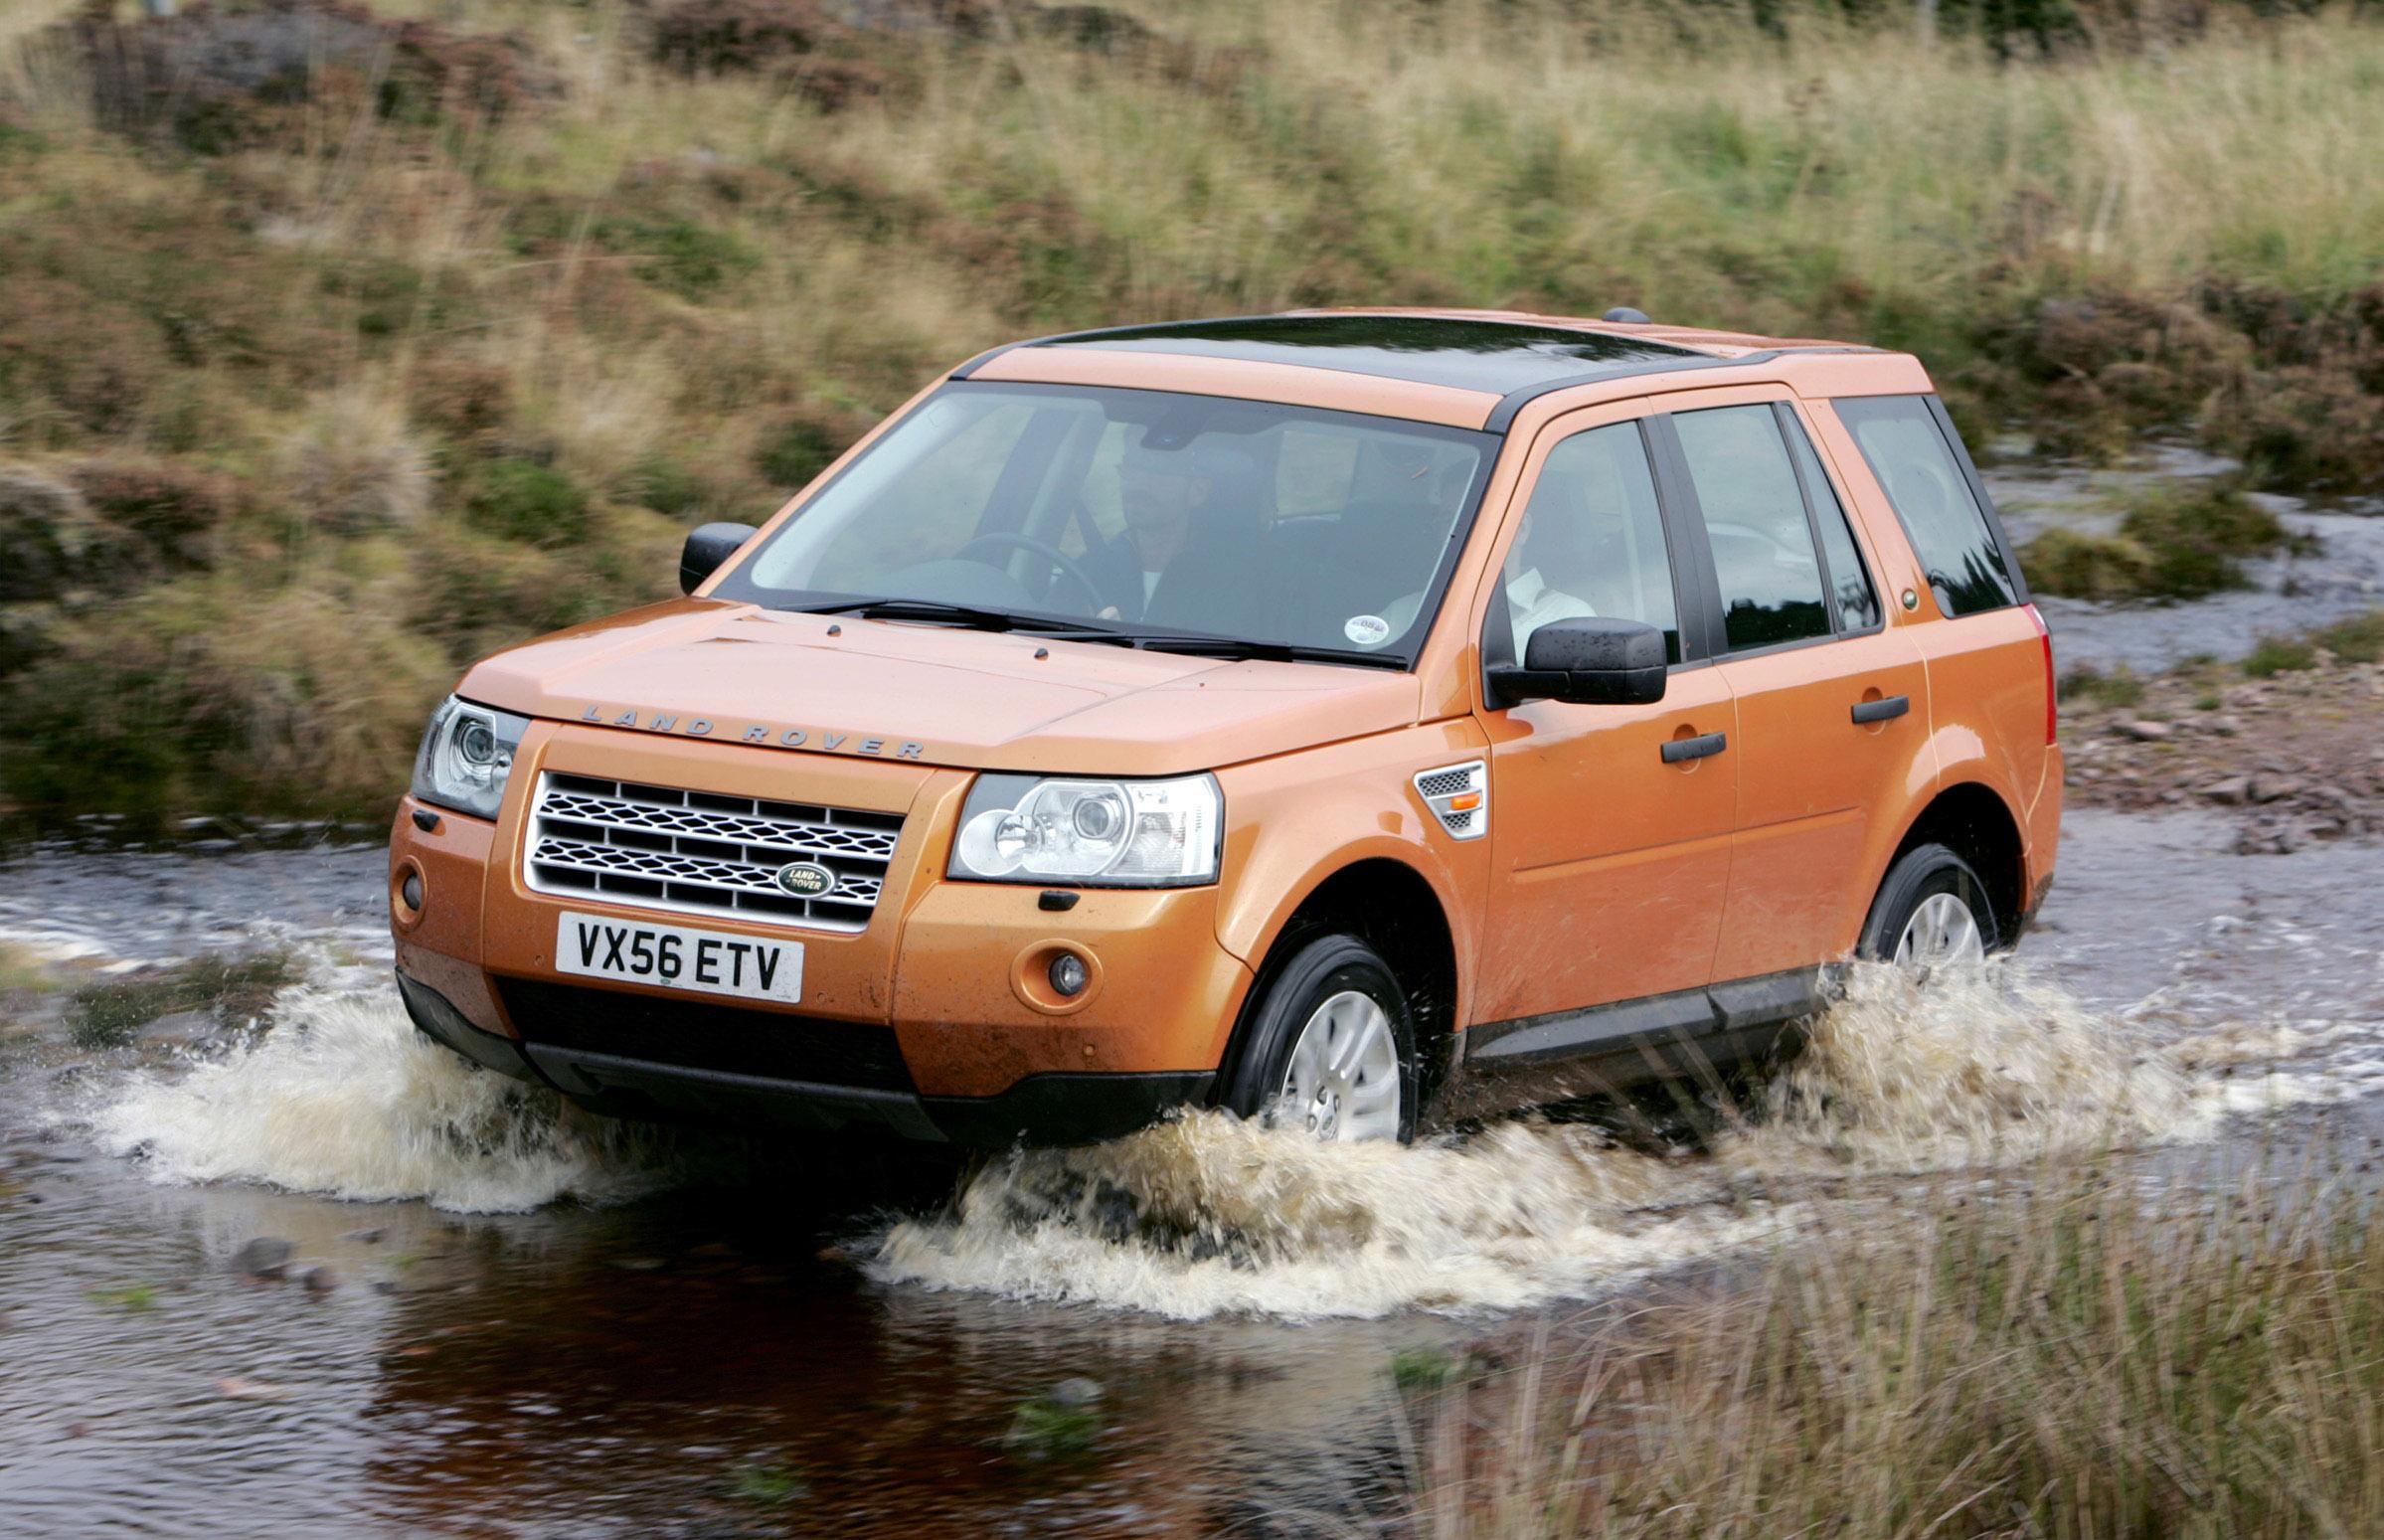 https://www.carsinvasion.com/gallery/2007-land-rover-freelander-2/2007-land-rover-freelander-2-05.jpg